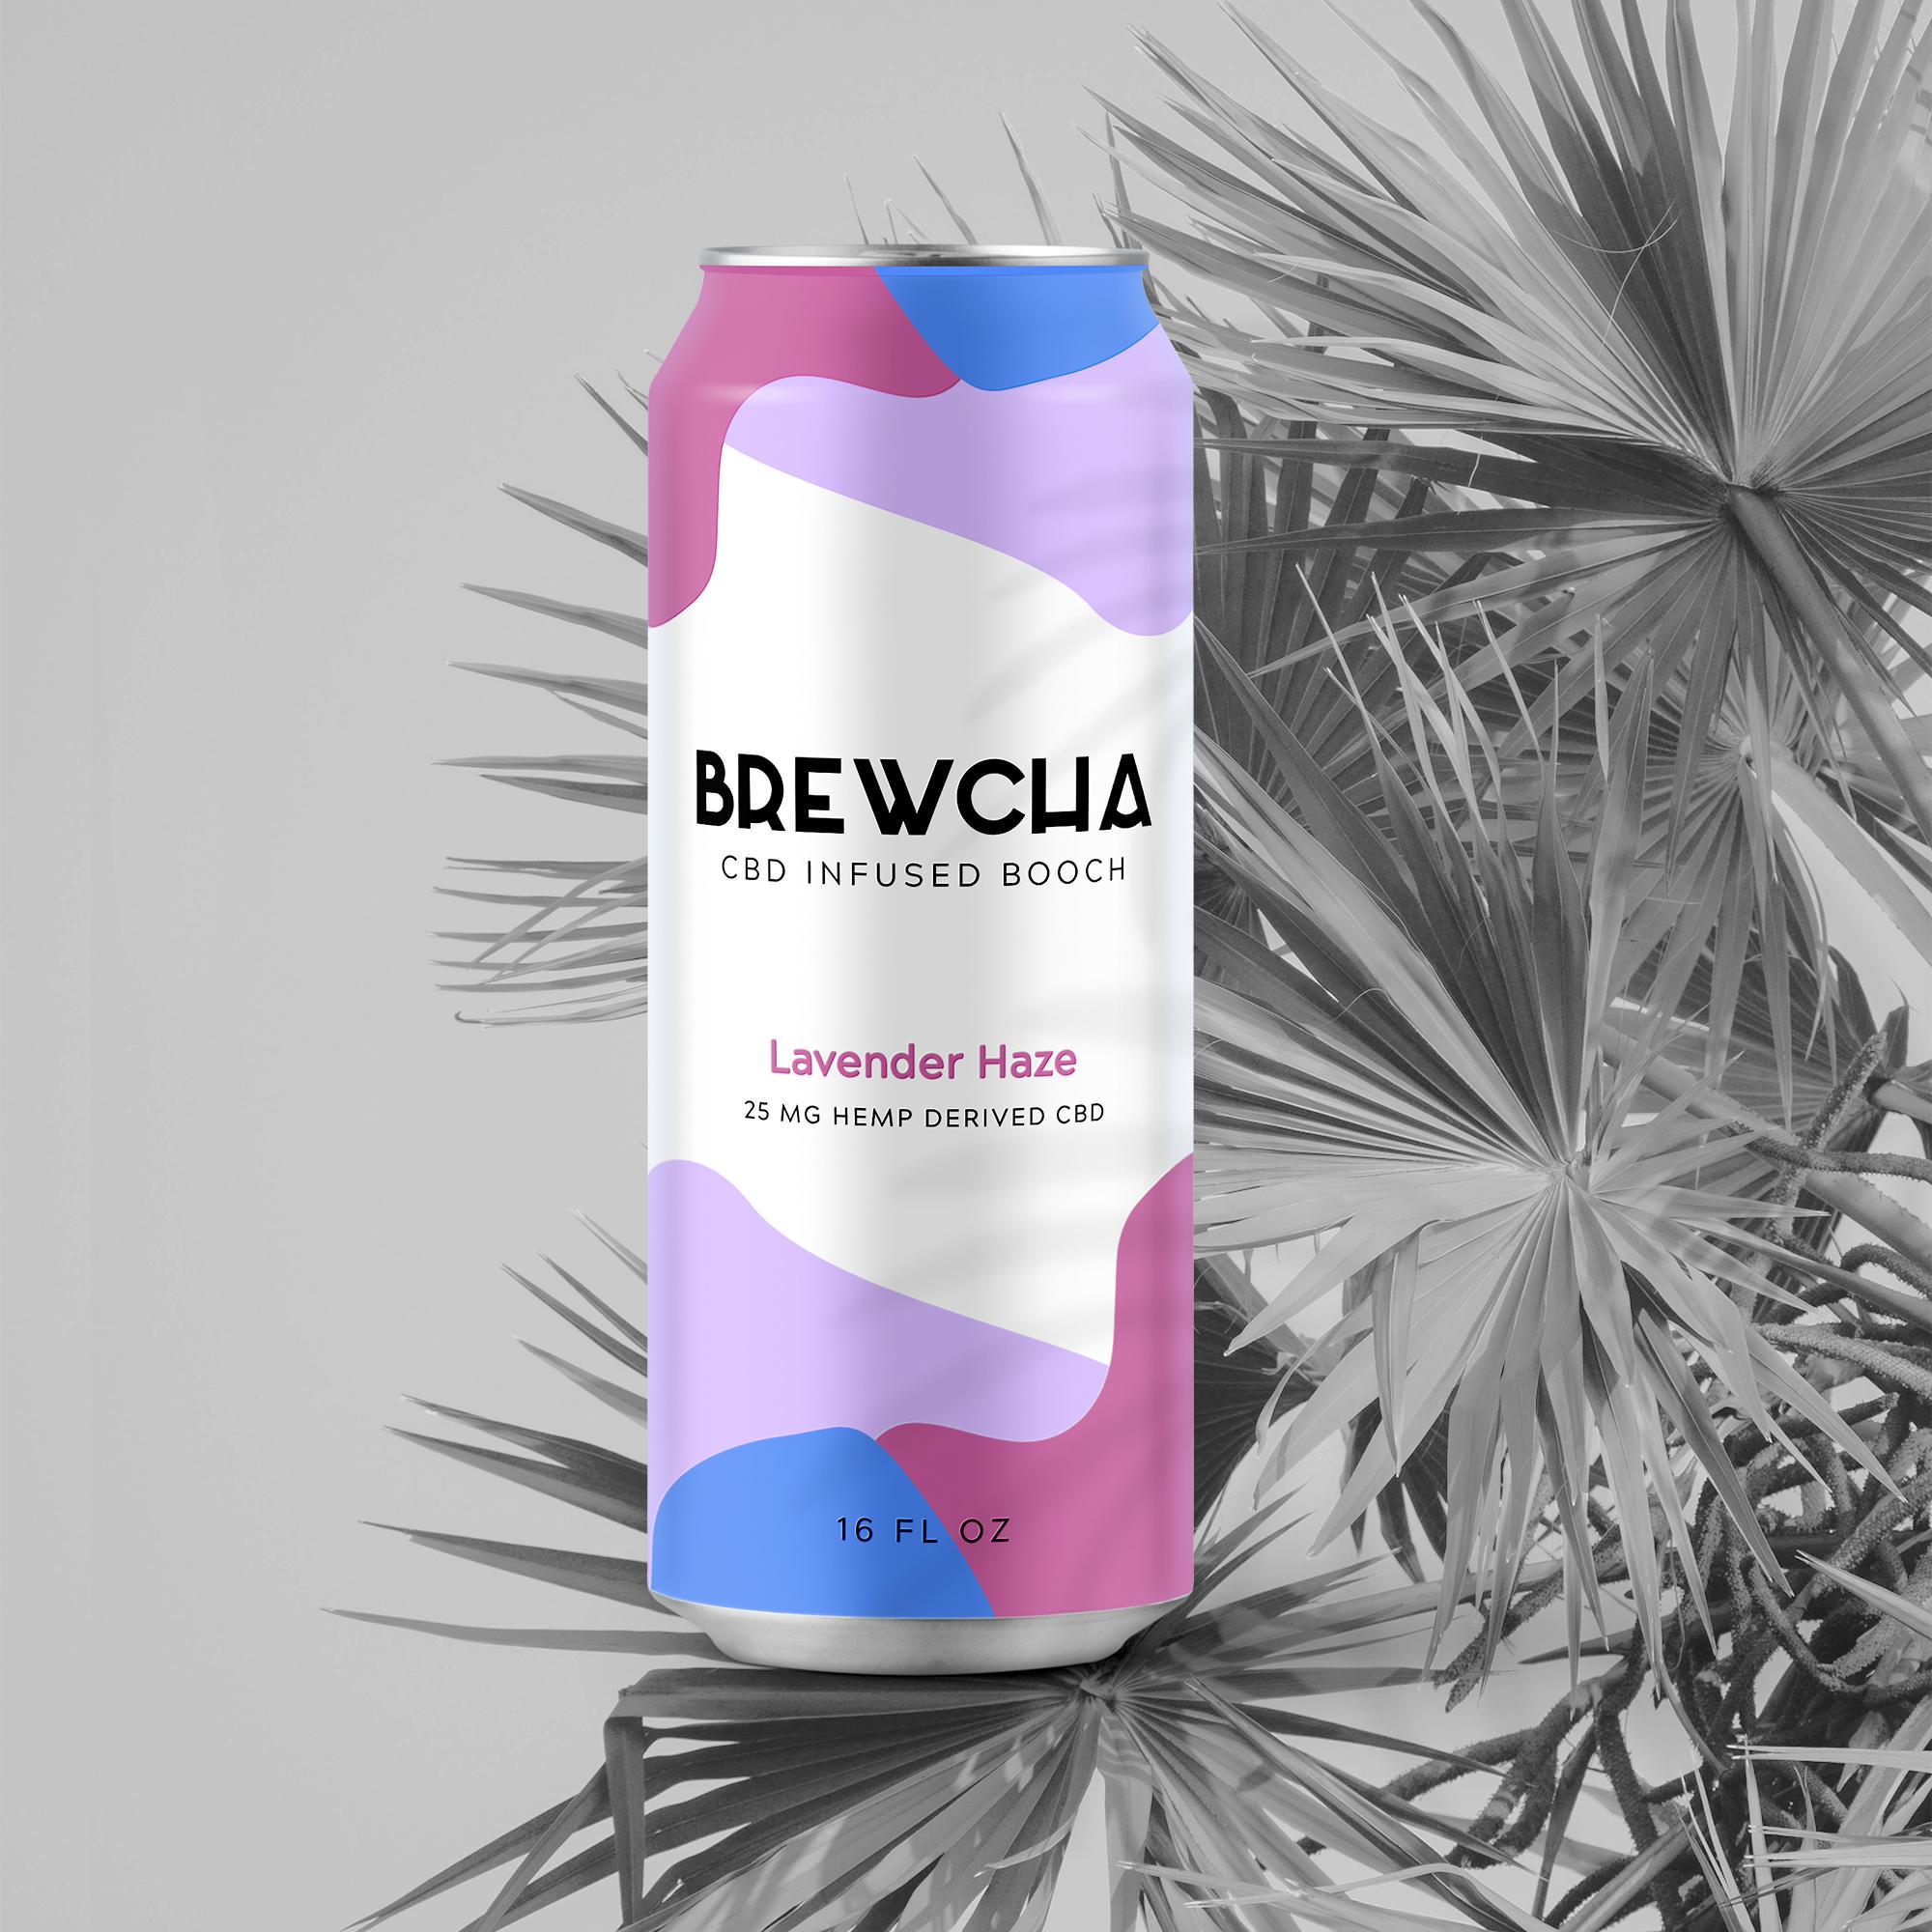 BREWCHA_Concept_01.jpg